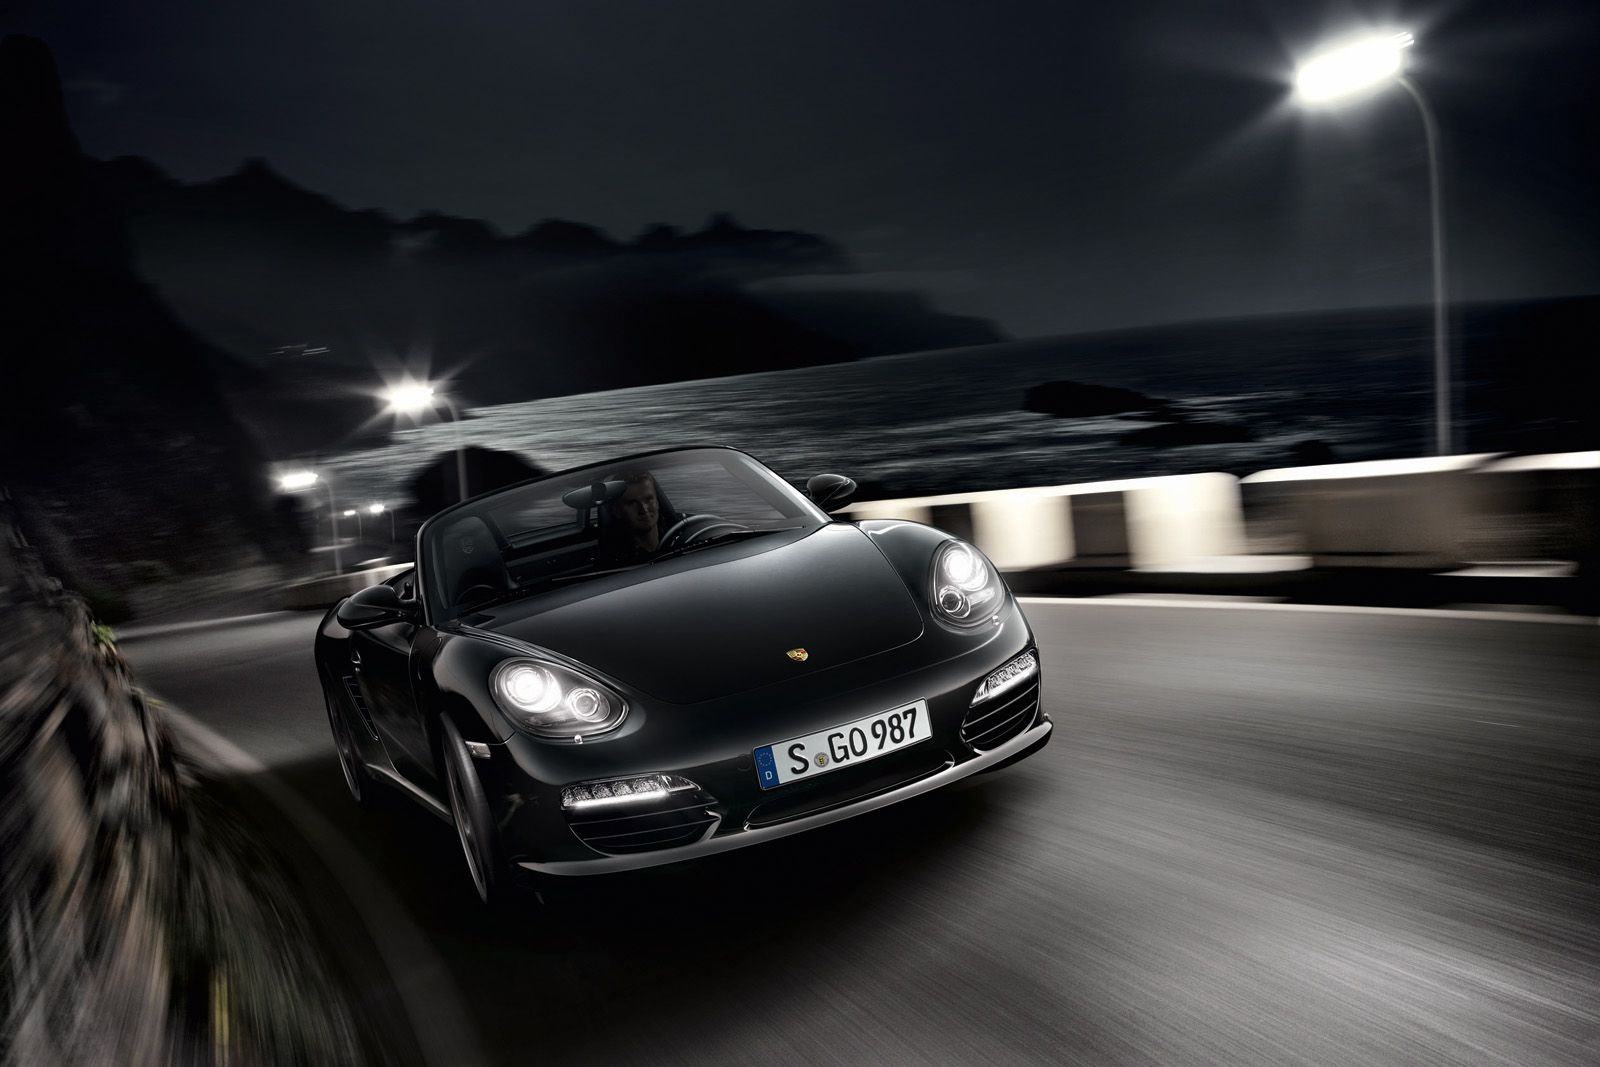 Used Porsche 911 For Sale >> 2011 Porsche Boxster S Black Edition Wallpapers